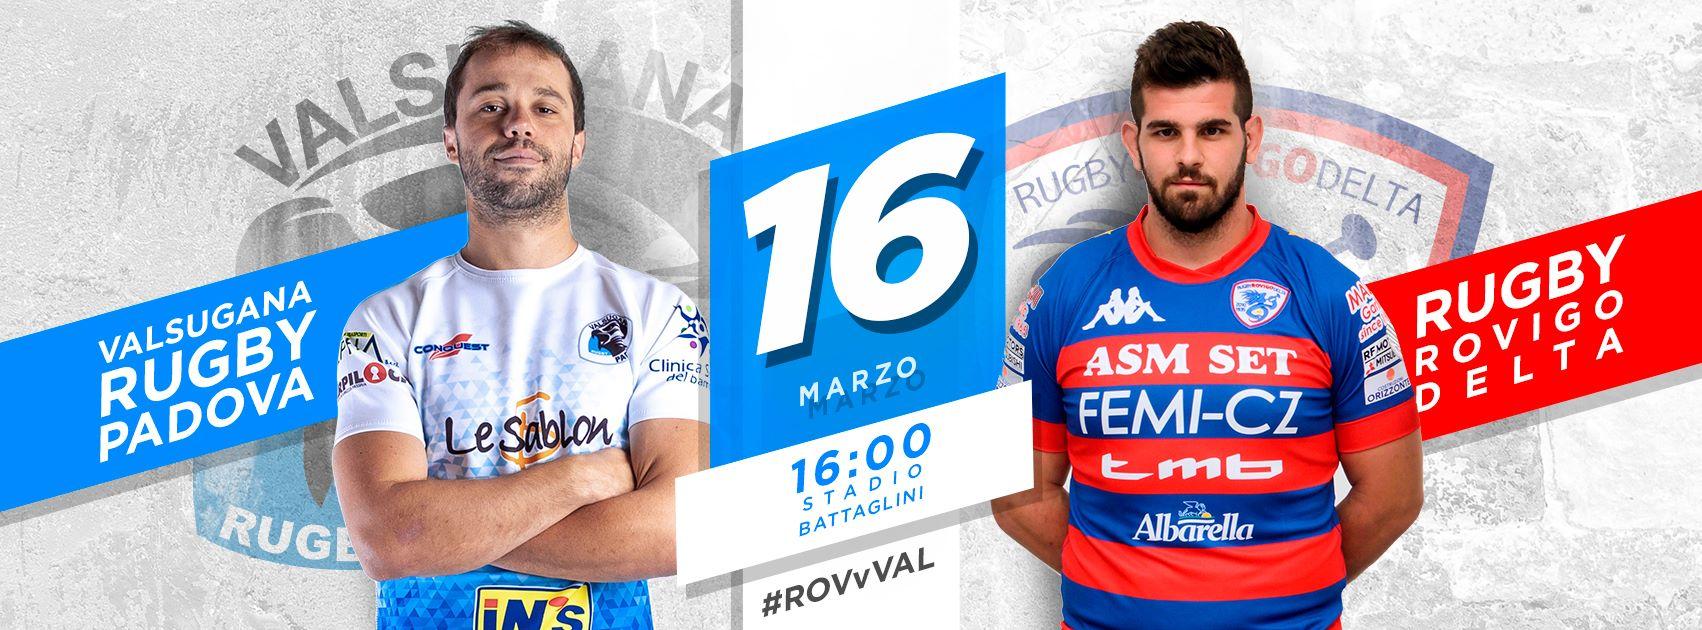 XVIII partita di Top12, FEMI-CZ Rovigo Delta vs. Valsugana Rugby Padova